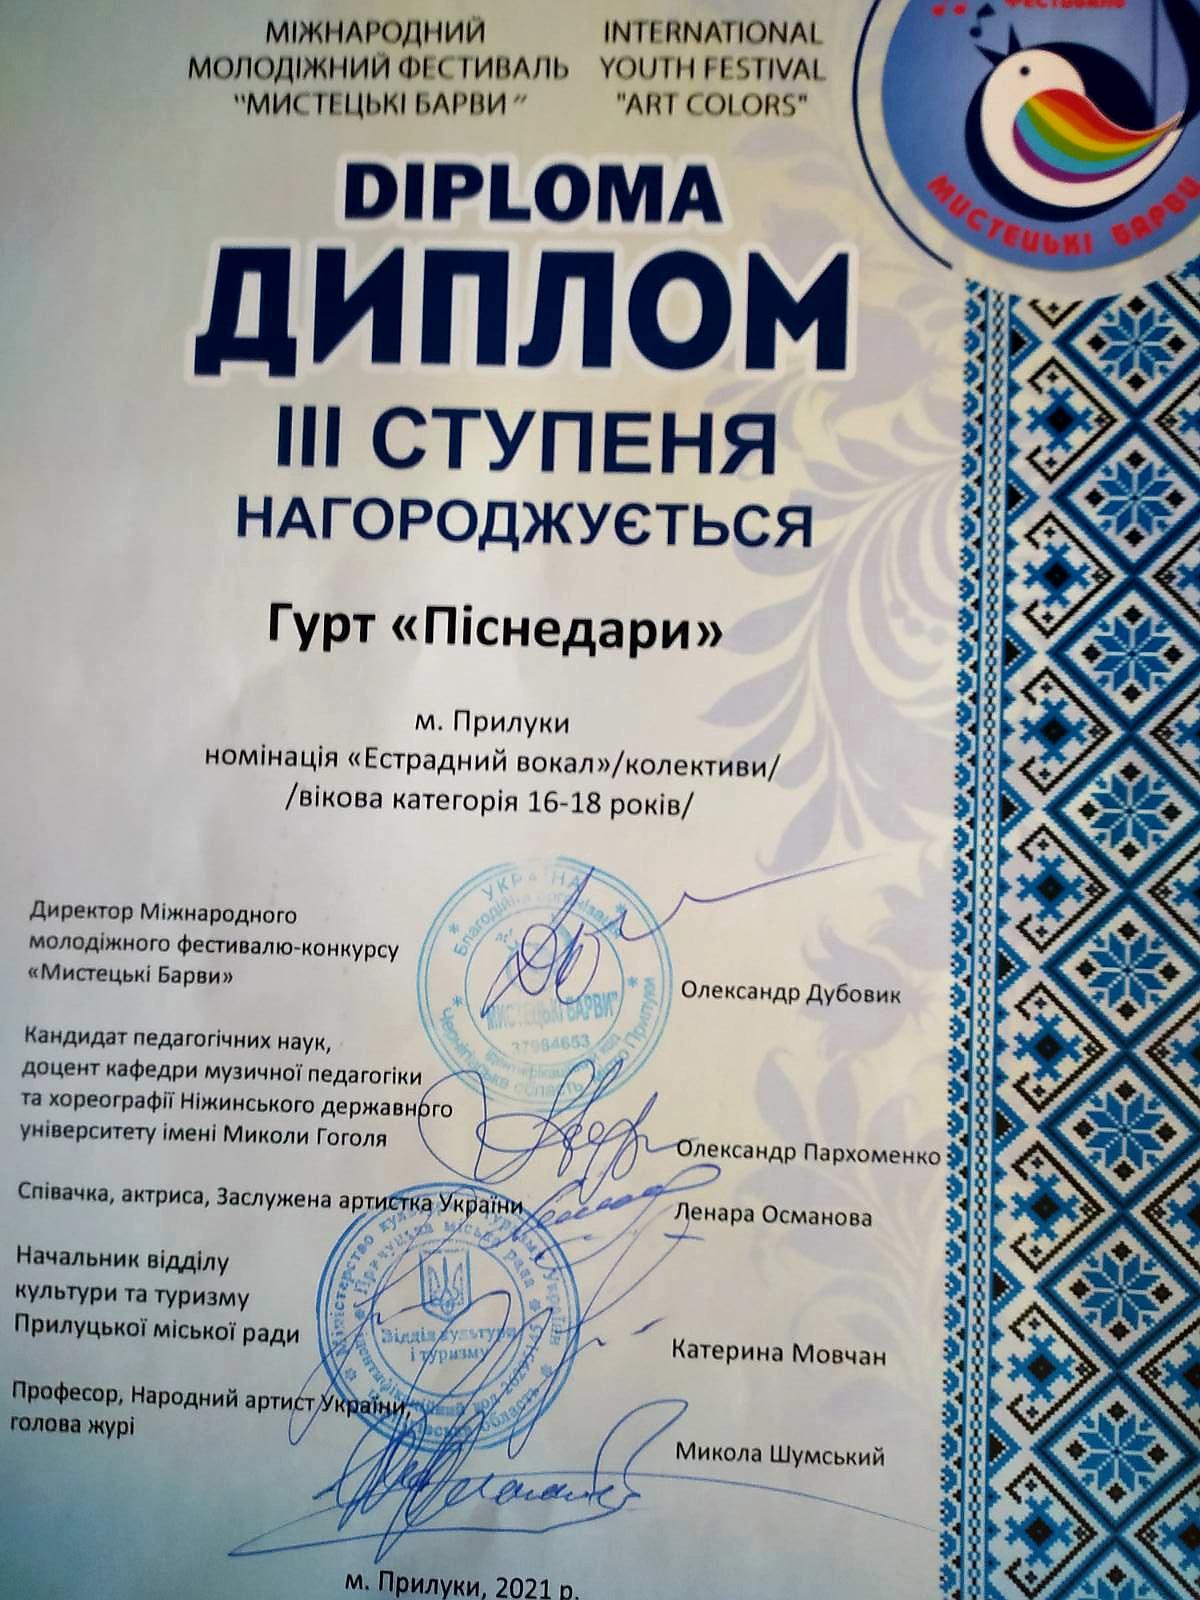 http://agrokoledg.at.ua/avatar/documents/vuhovna/hydoznjasam/20210325_152453.jpg